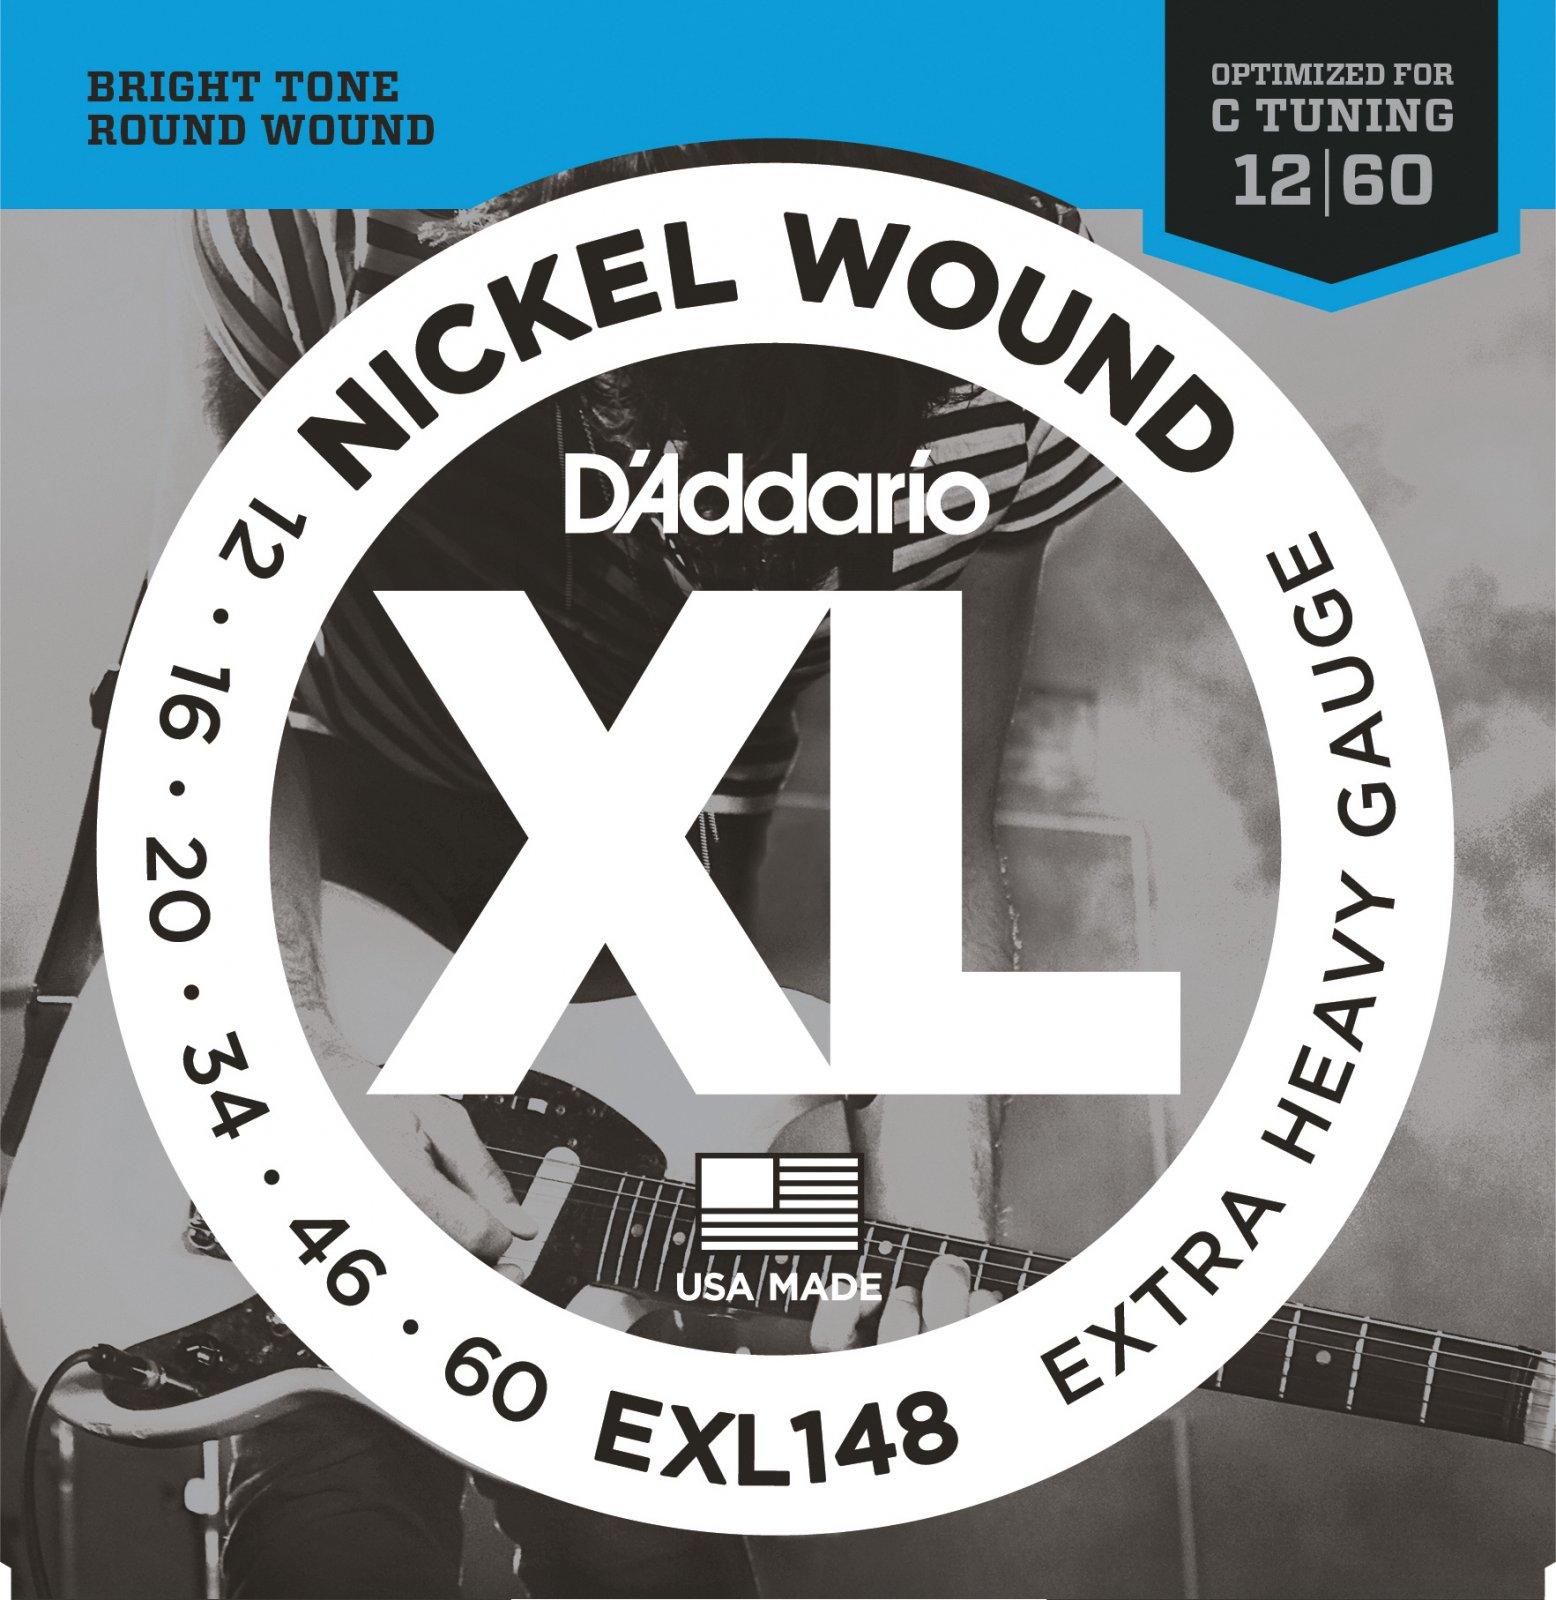 D'Addario EXL148 Nickel Wound Electric Guitar Strings - Extra-Heavy, 12-60, C-tuning